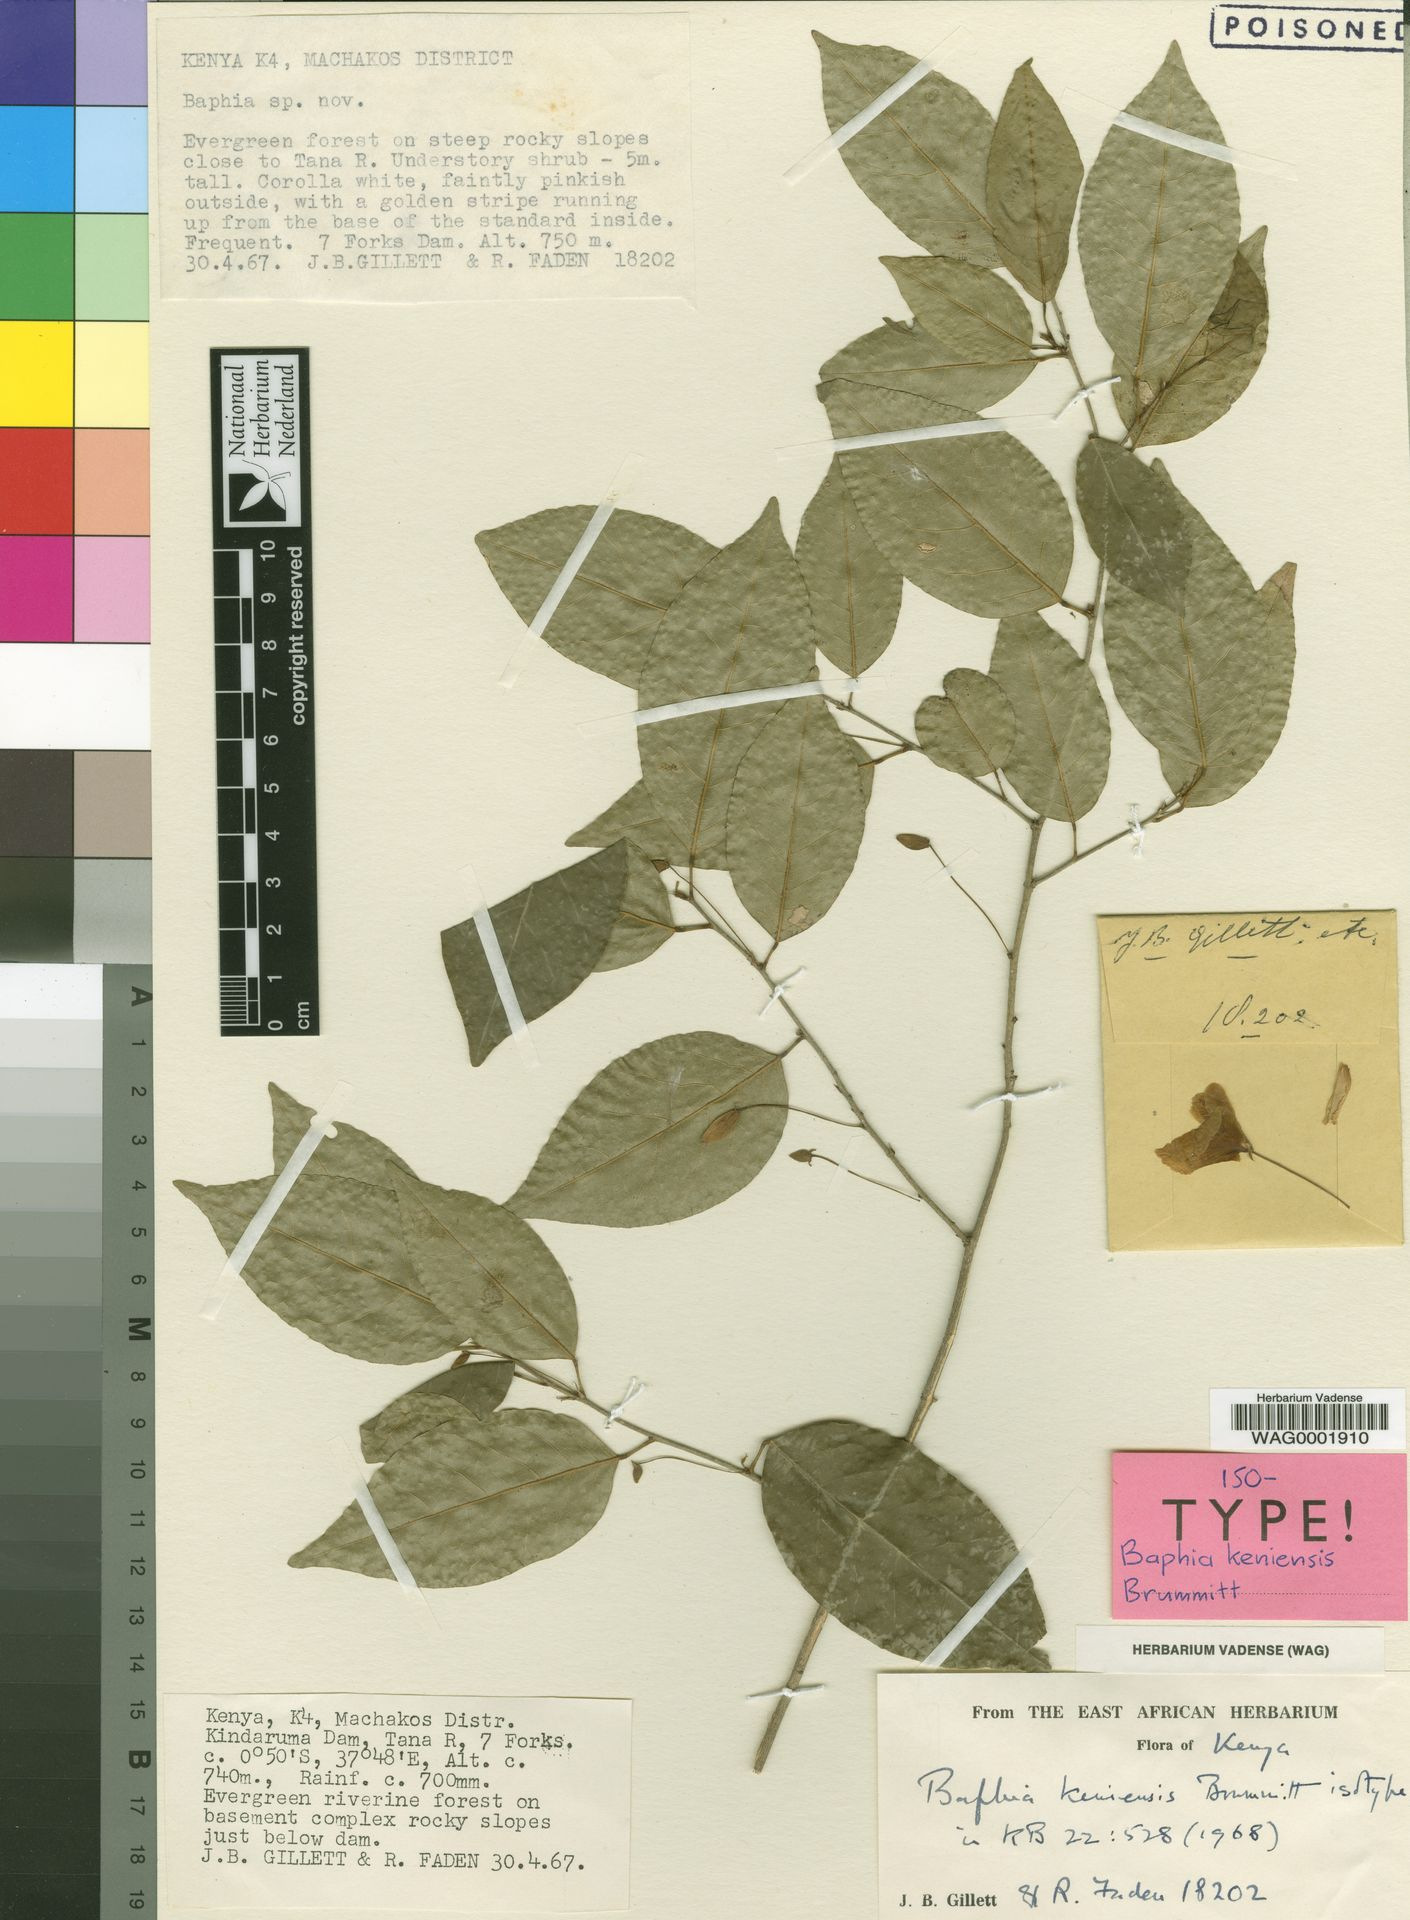 WAG0001910 | Baphia keniensis Brummitt